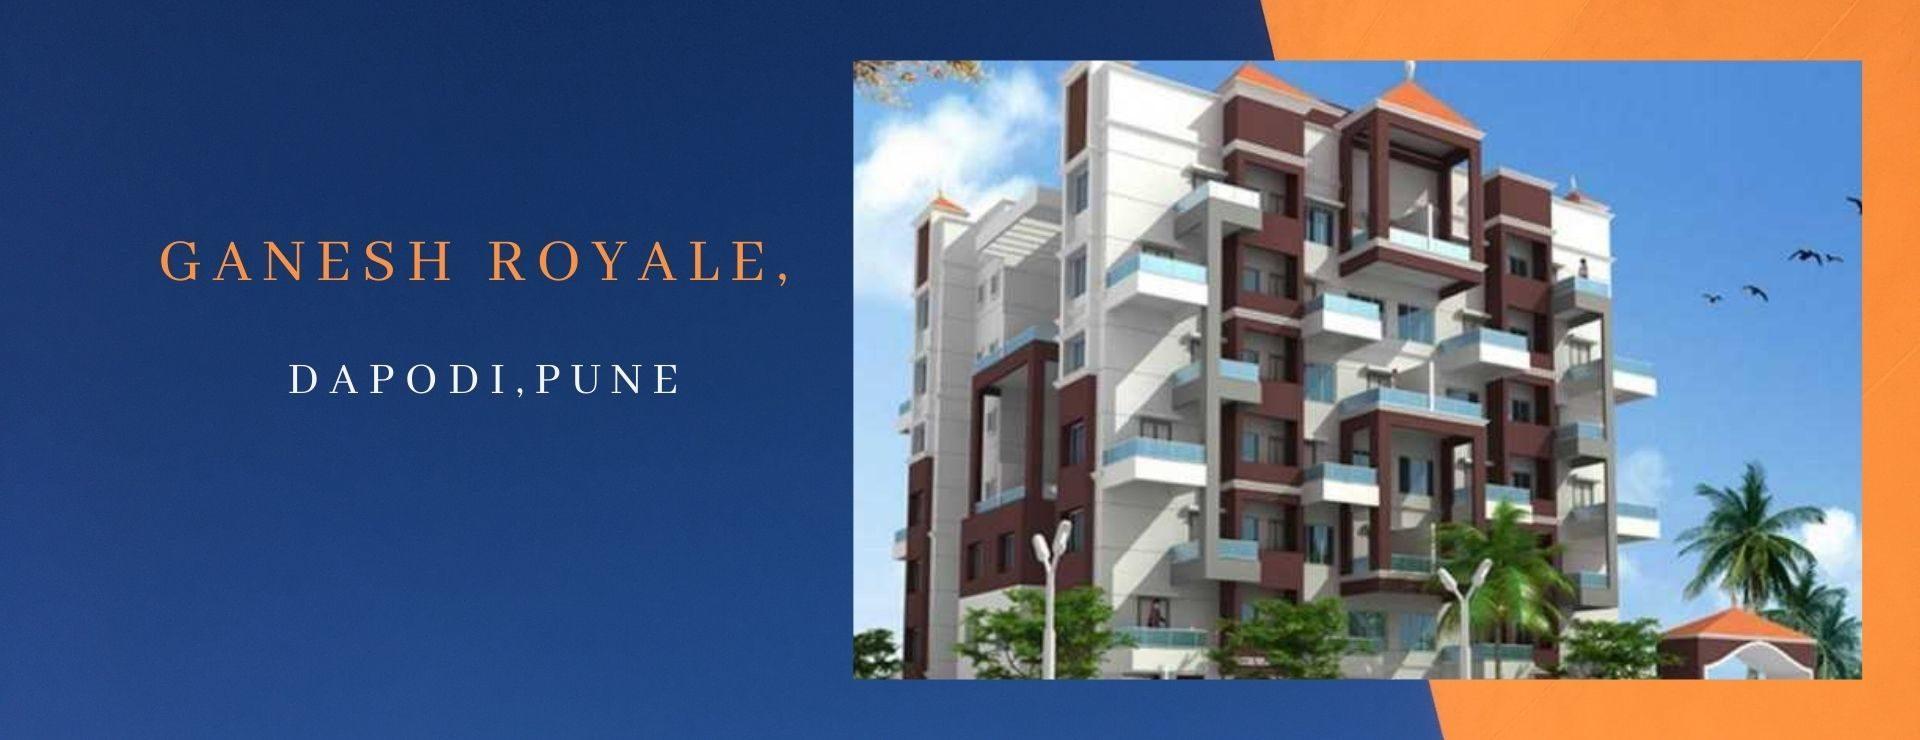 Ganesh Royale,Dapodi,Pune